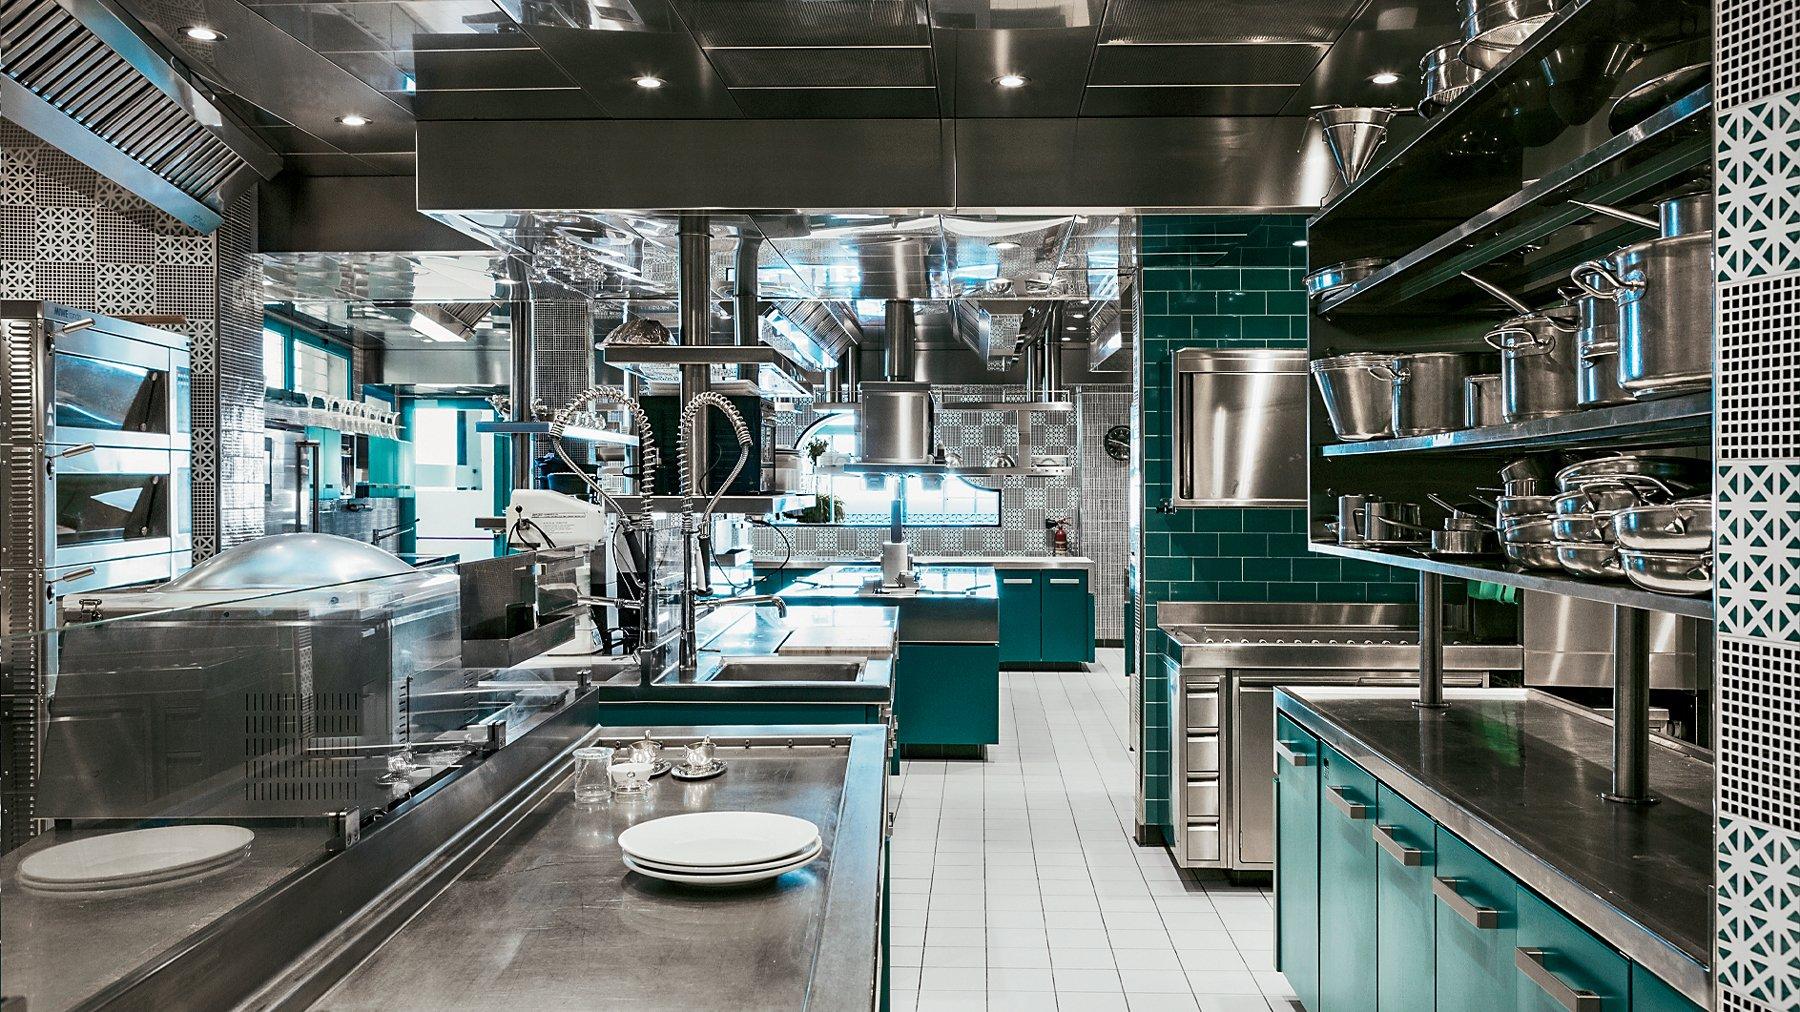 Dark Kitchen sur le blog C'est Mon Resto